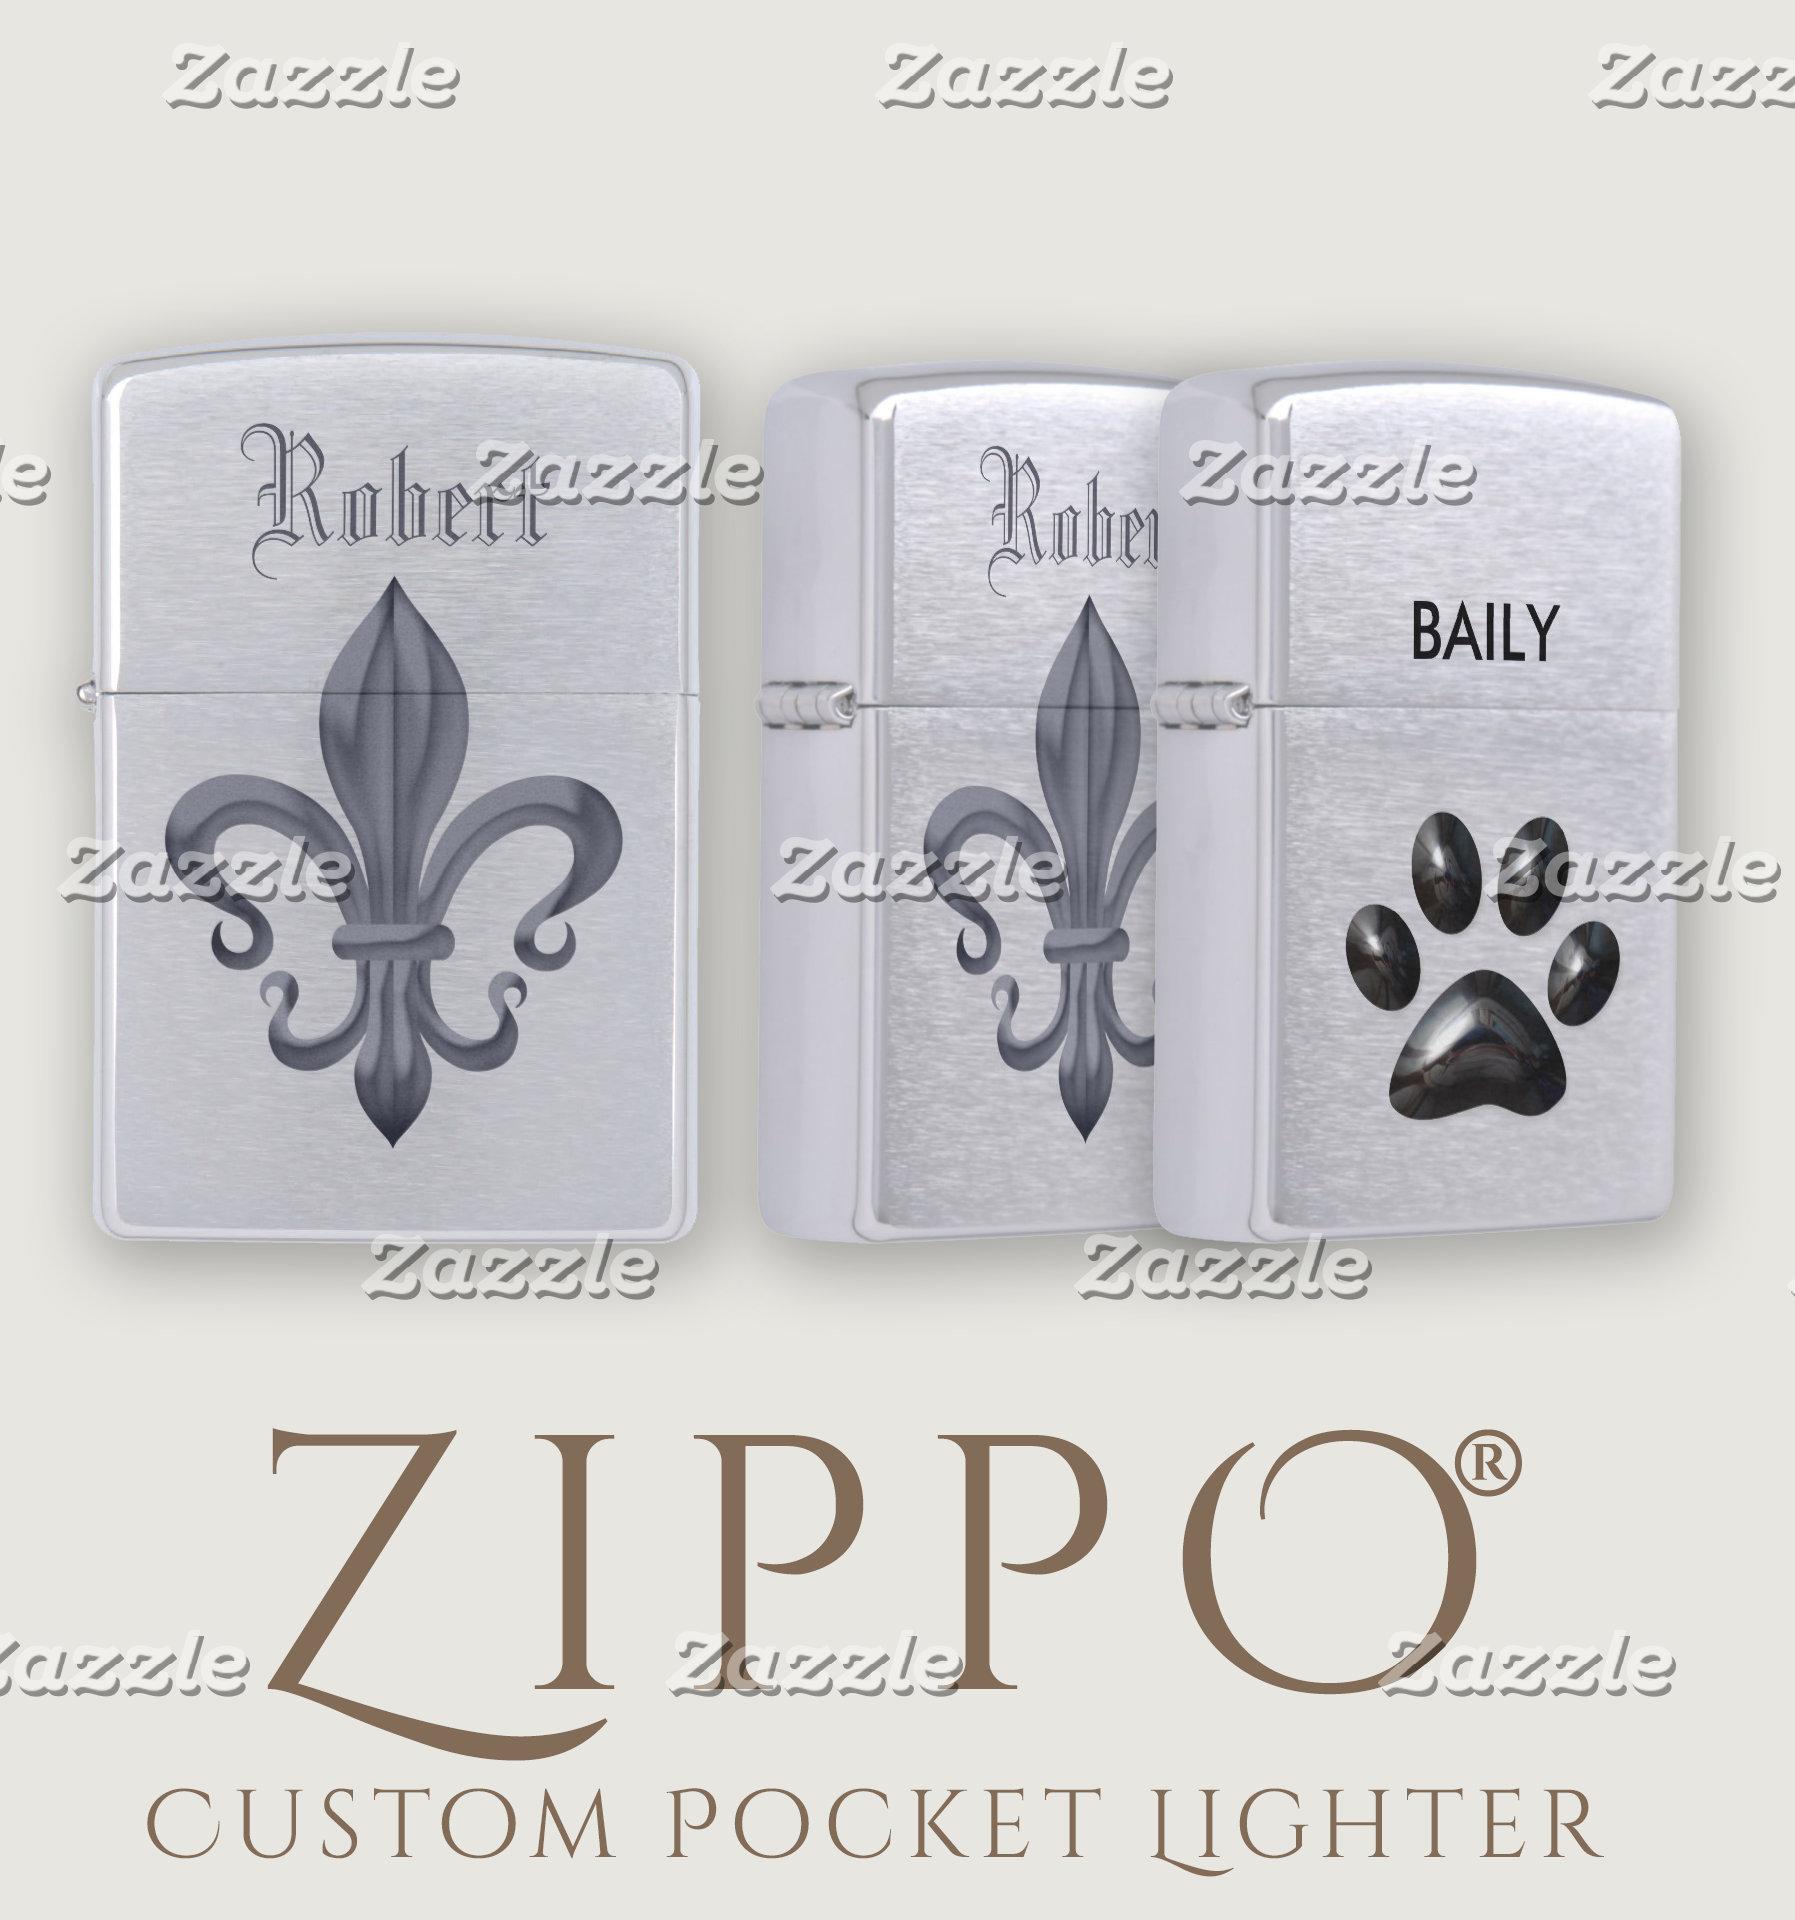 Zippo Lighters